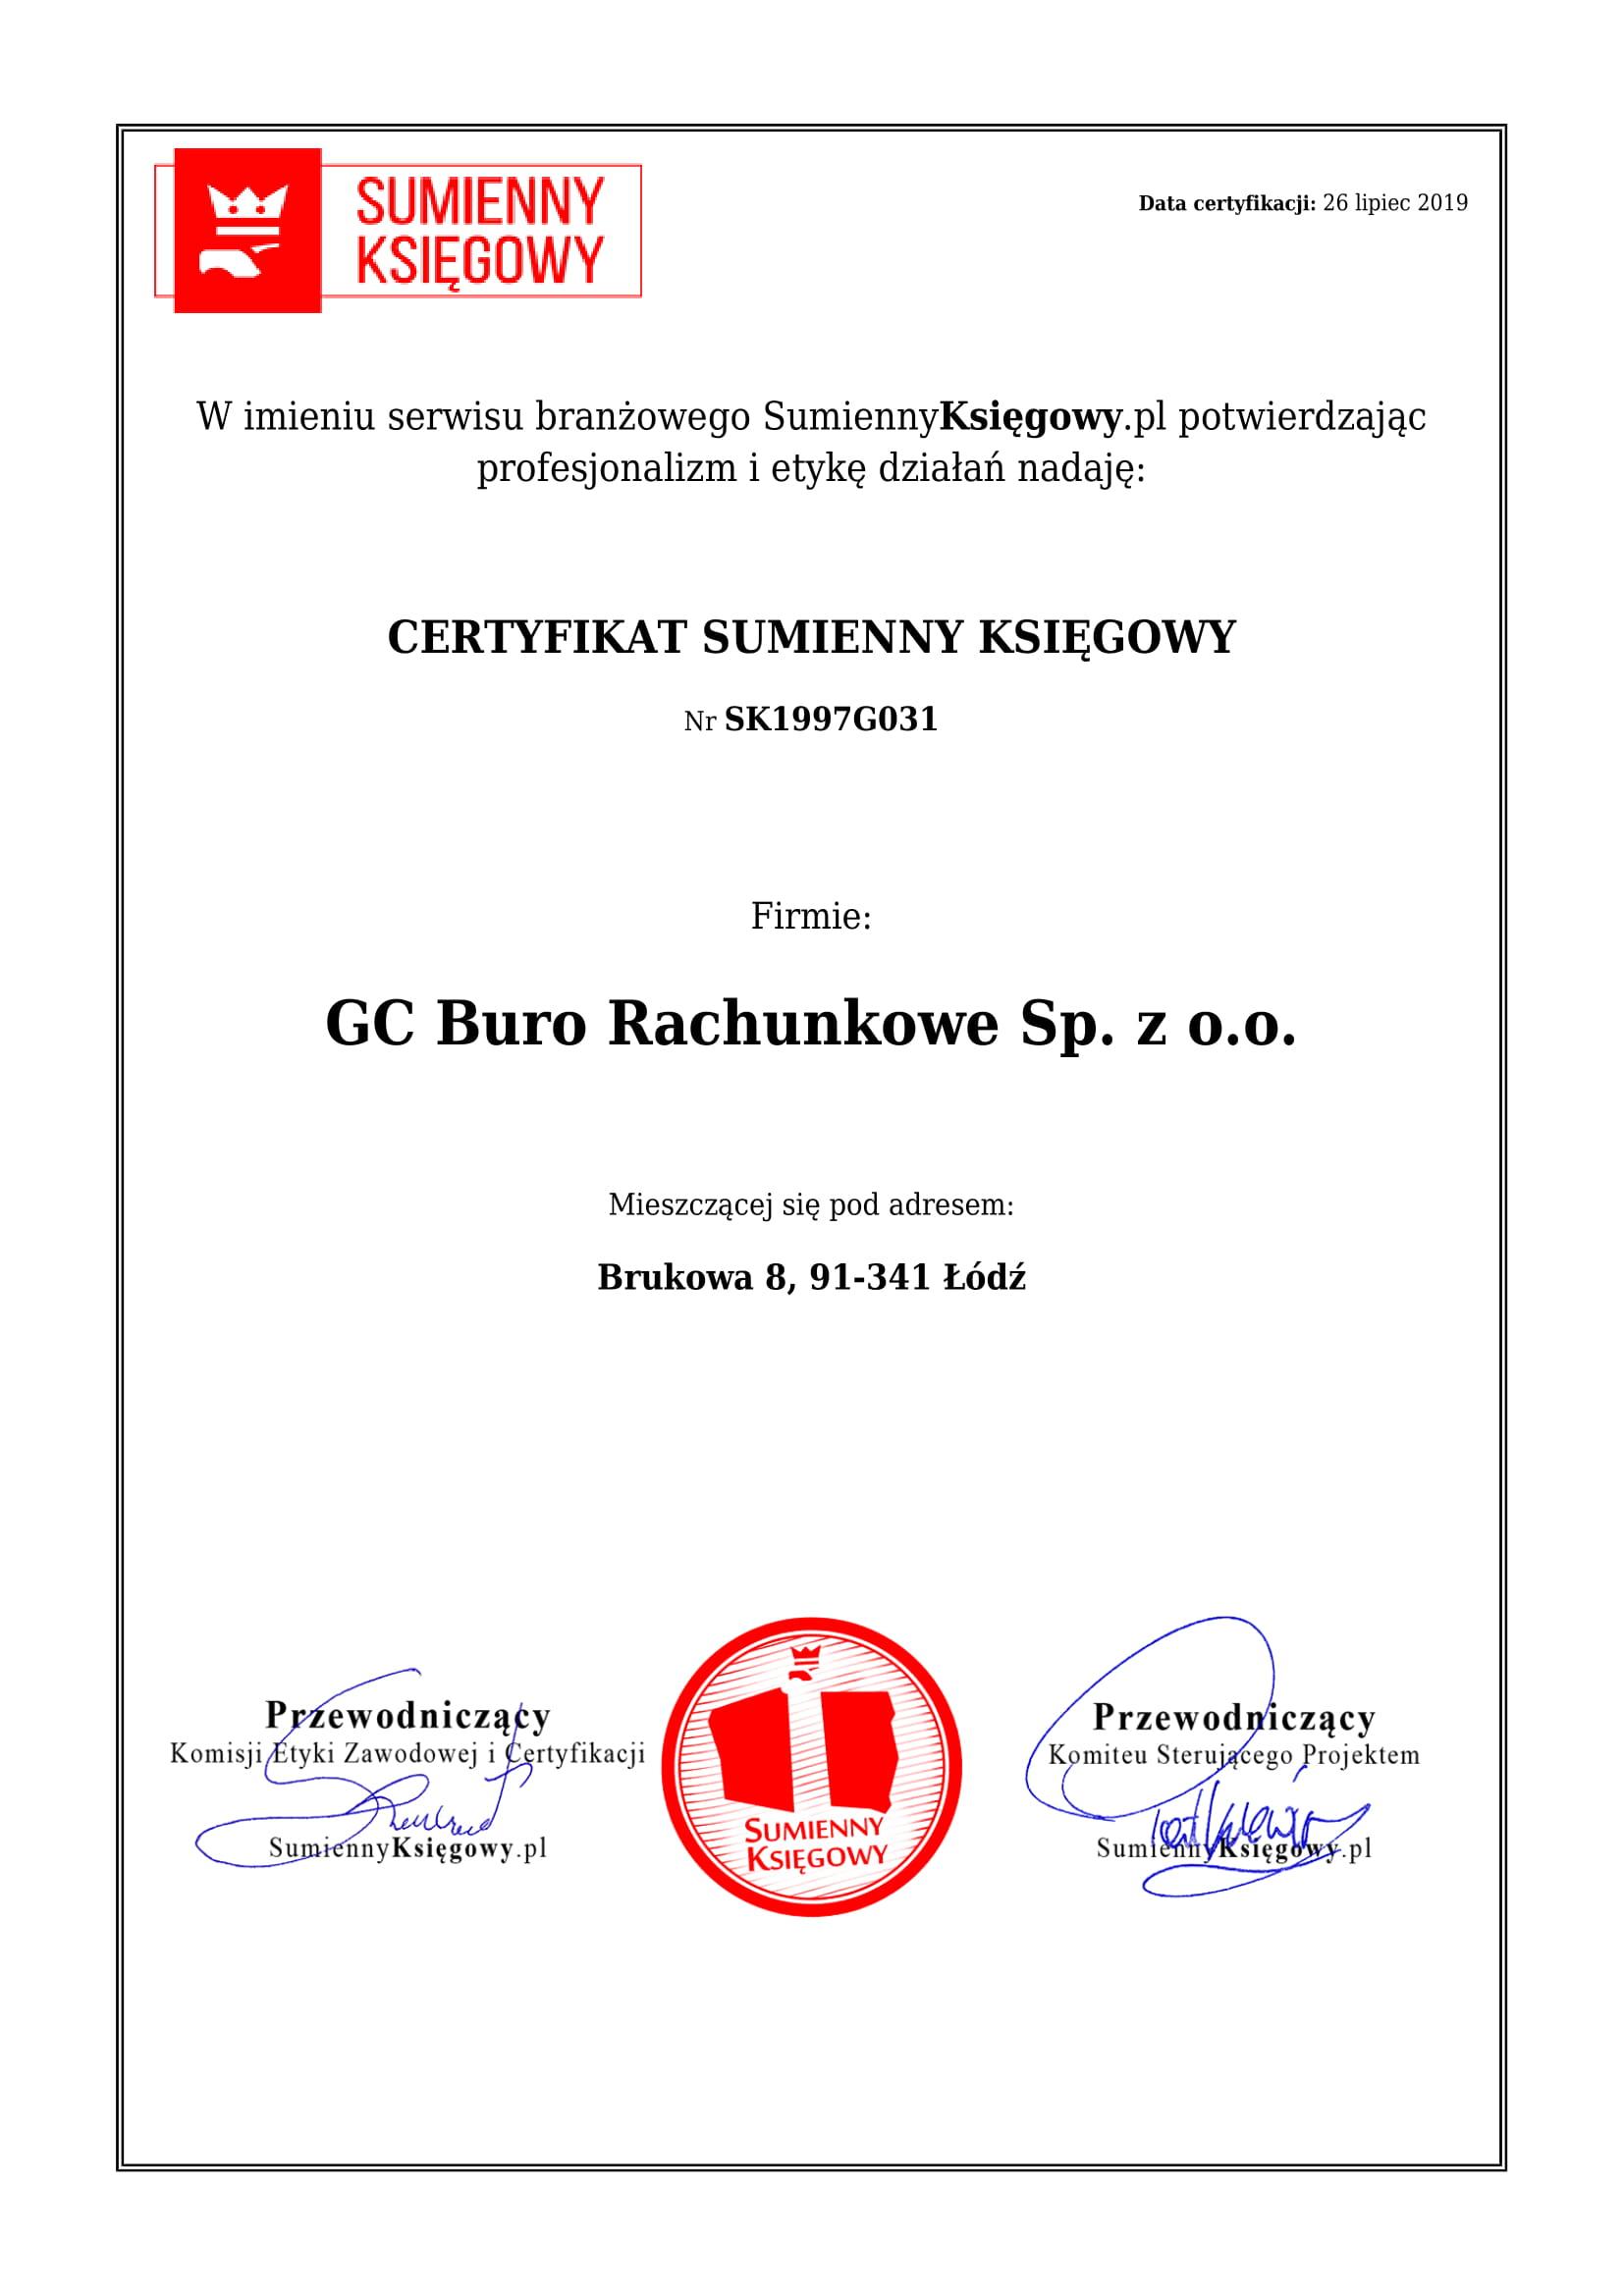 Certyfikat DGC Biuro Rachunkowe Sp. z o.o.